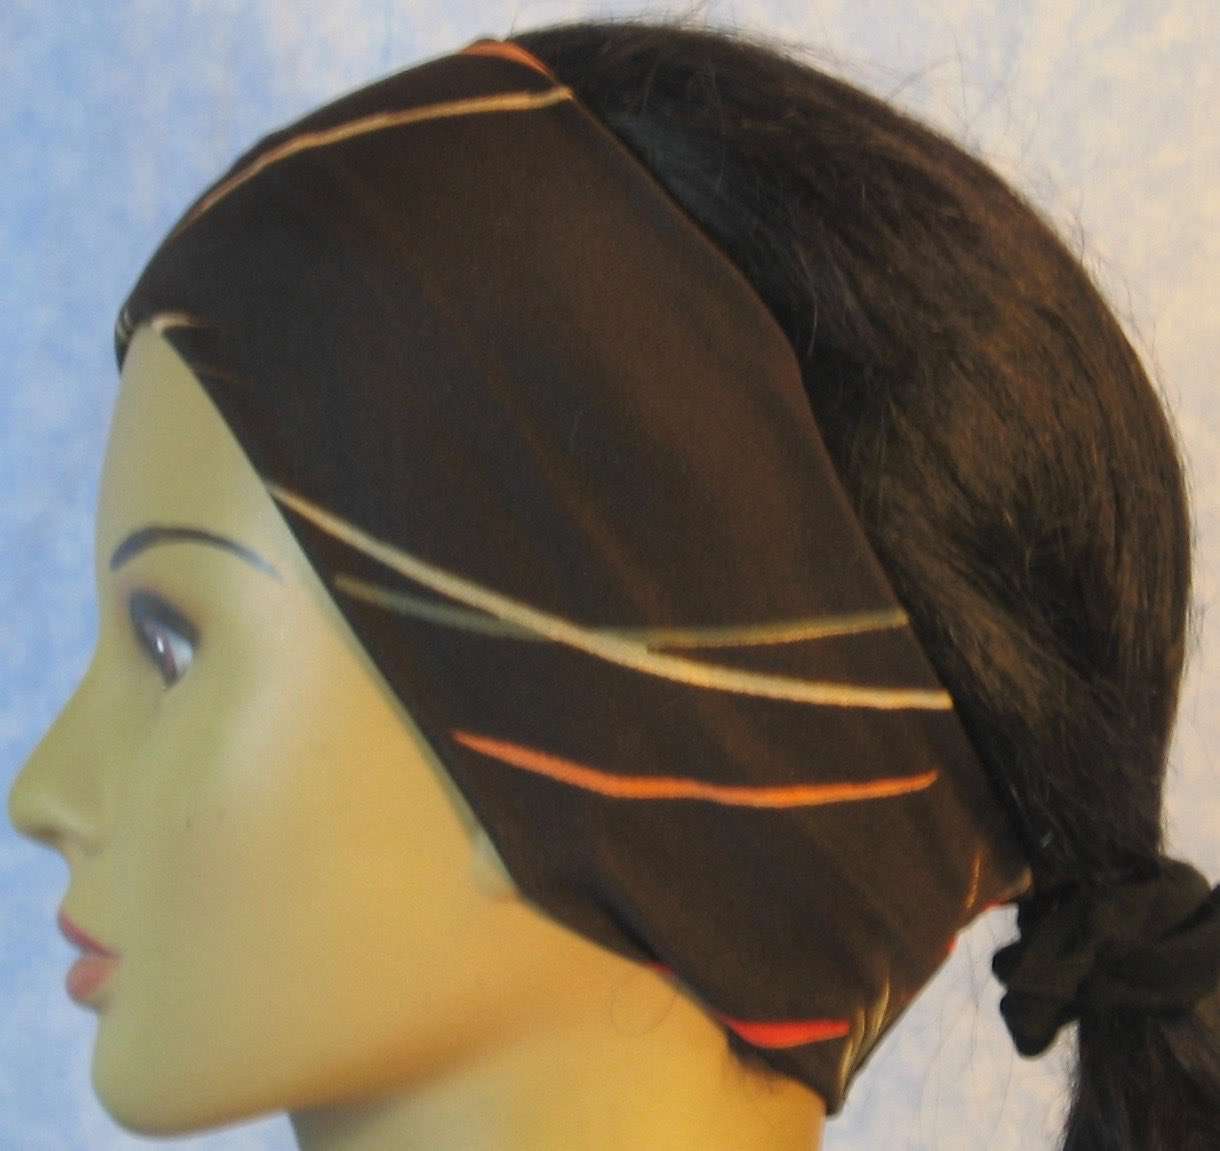 Headband-Brown With Gray Tan Brush Strokes-left